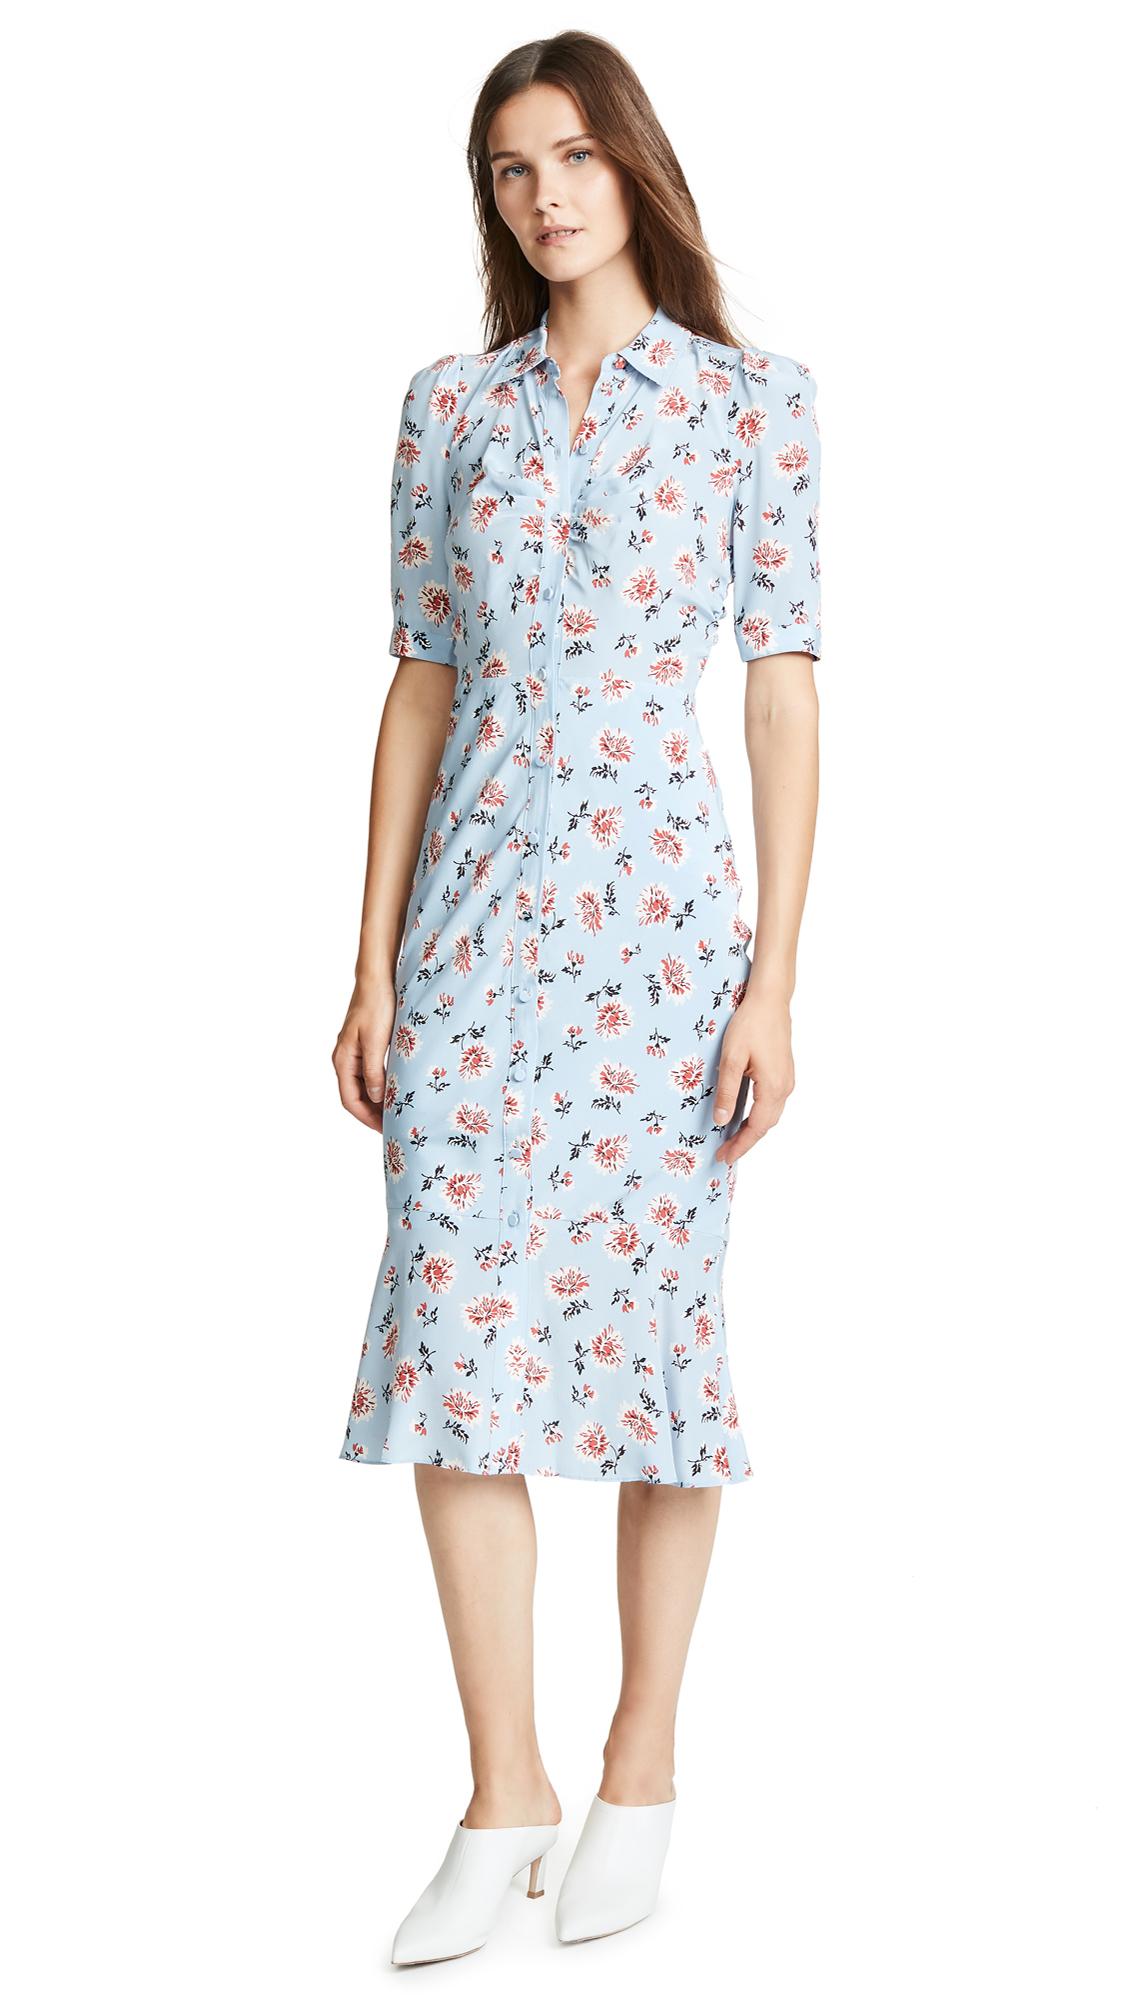 Veronica Beard Pike Dress In Sky Blue Multi